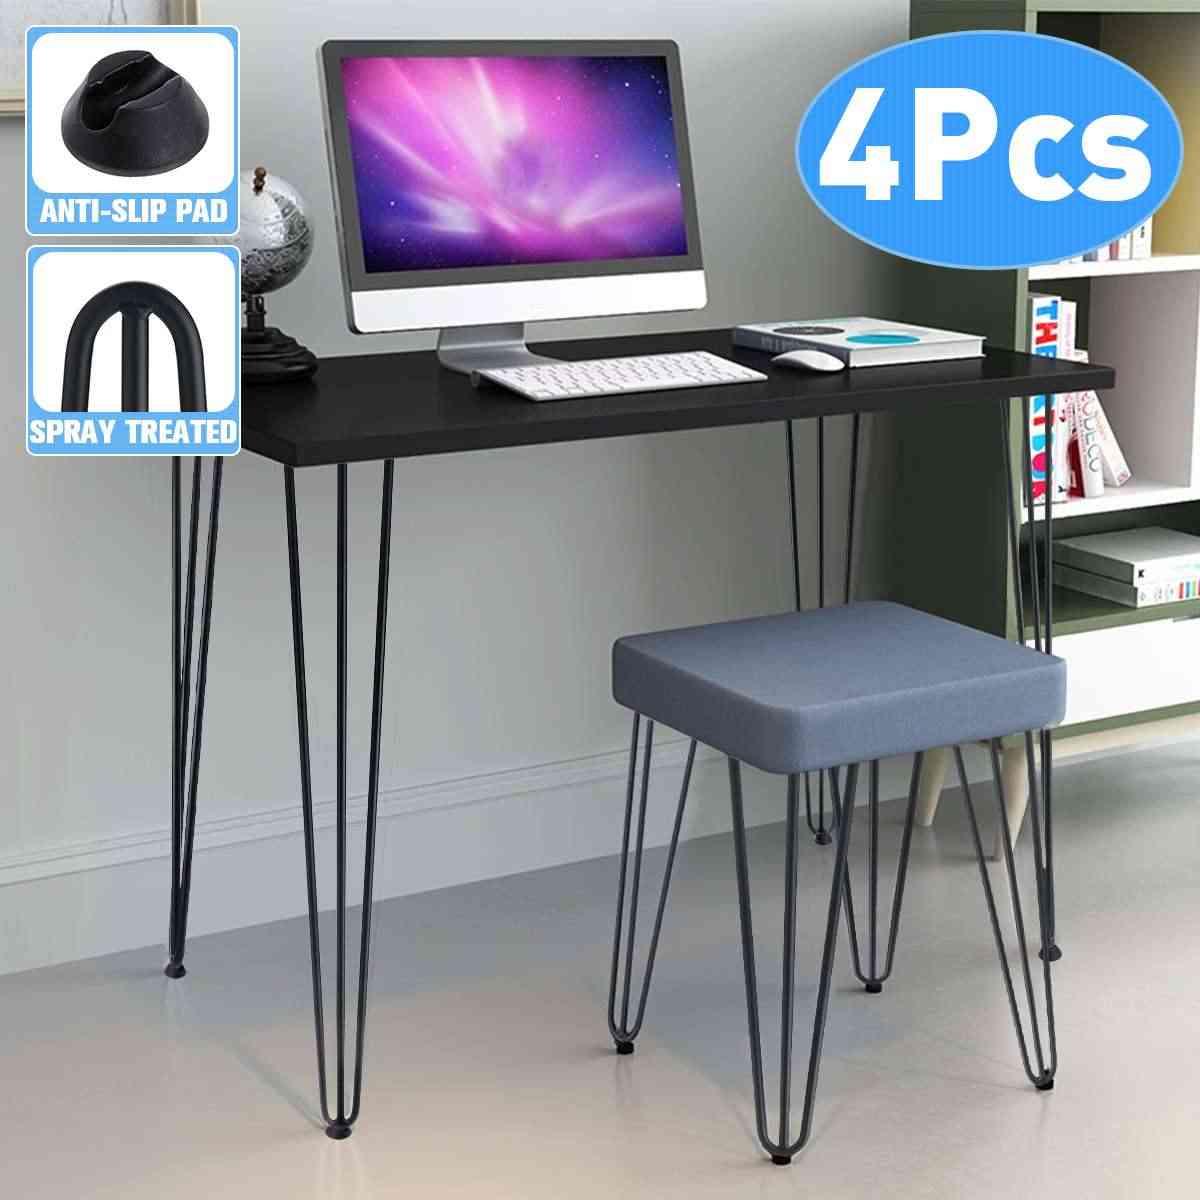 4pcs Table Legs Solid Iron Metal Table Desk Leg 28 30 Inch Table Chair Laptop Desk Hairpin Legs Anti Slip Diy Furniture Legs Furniture Legs Aliexpress